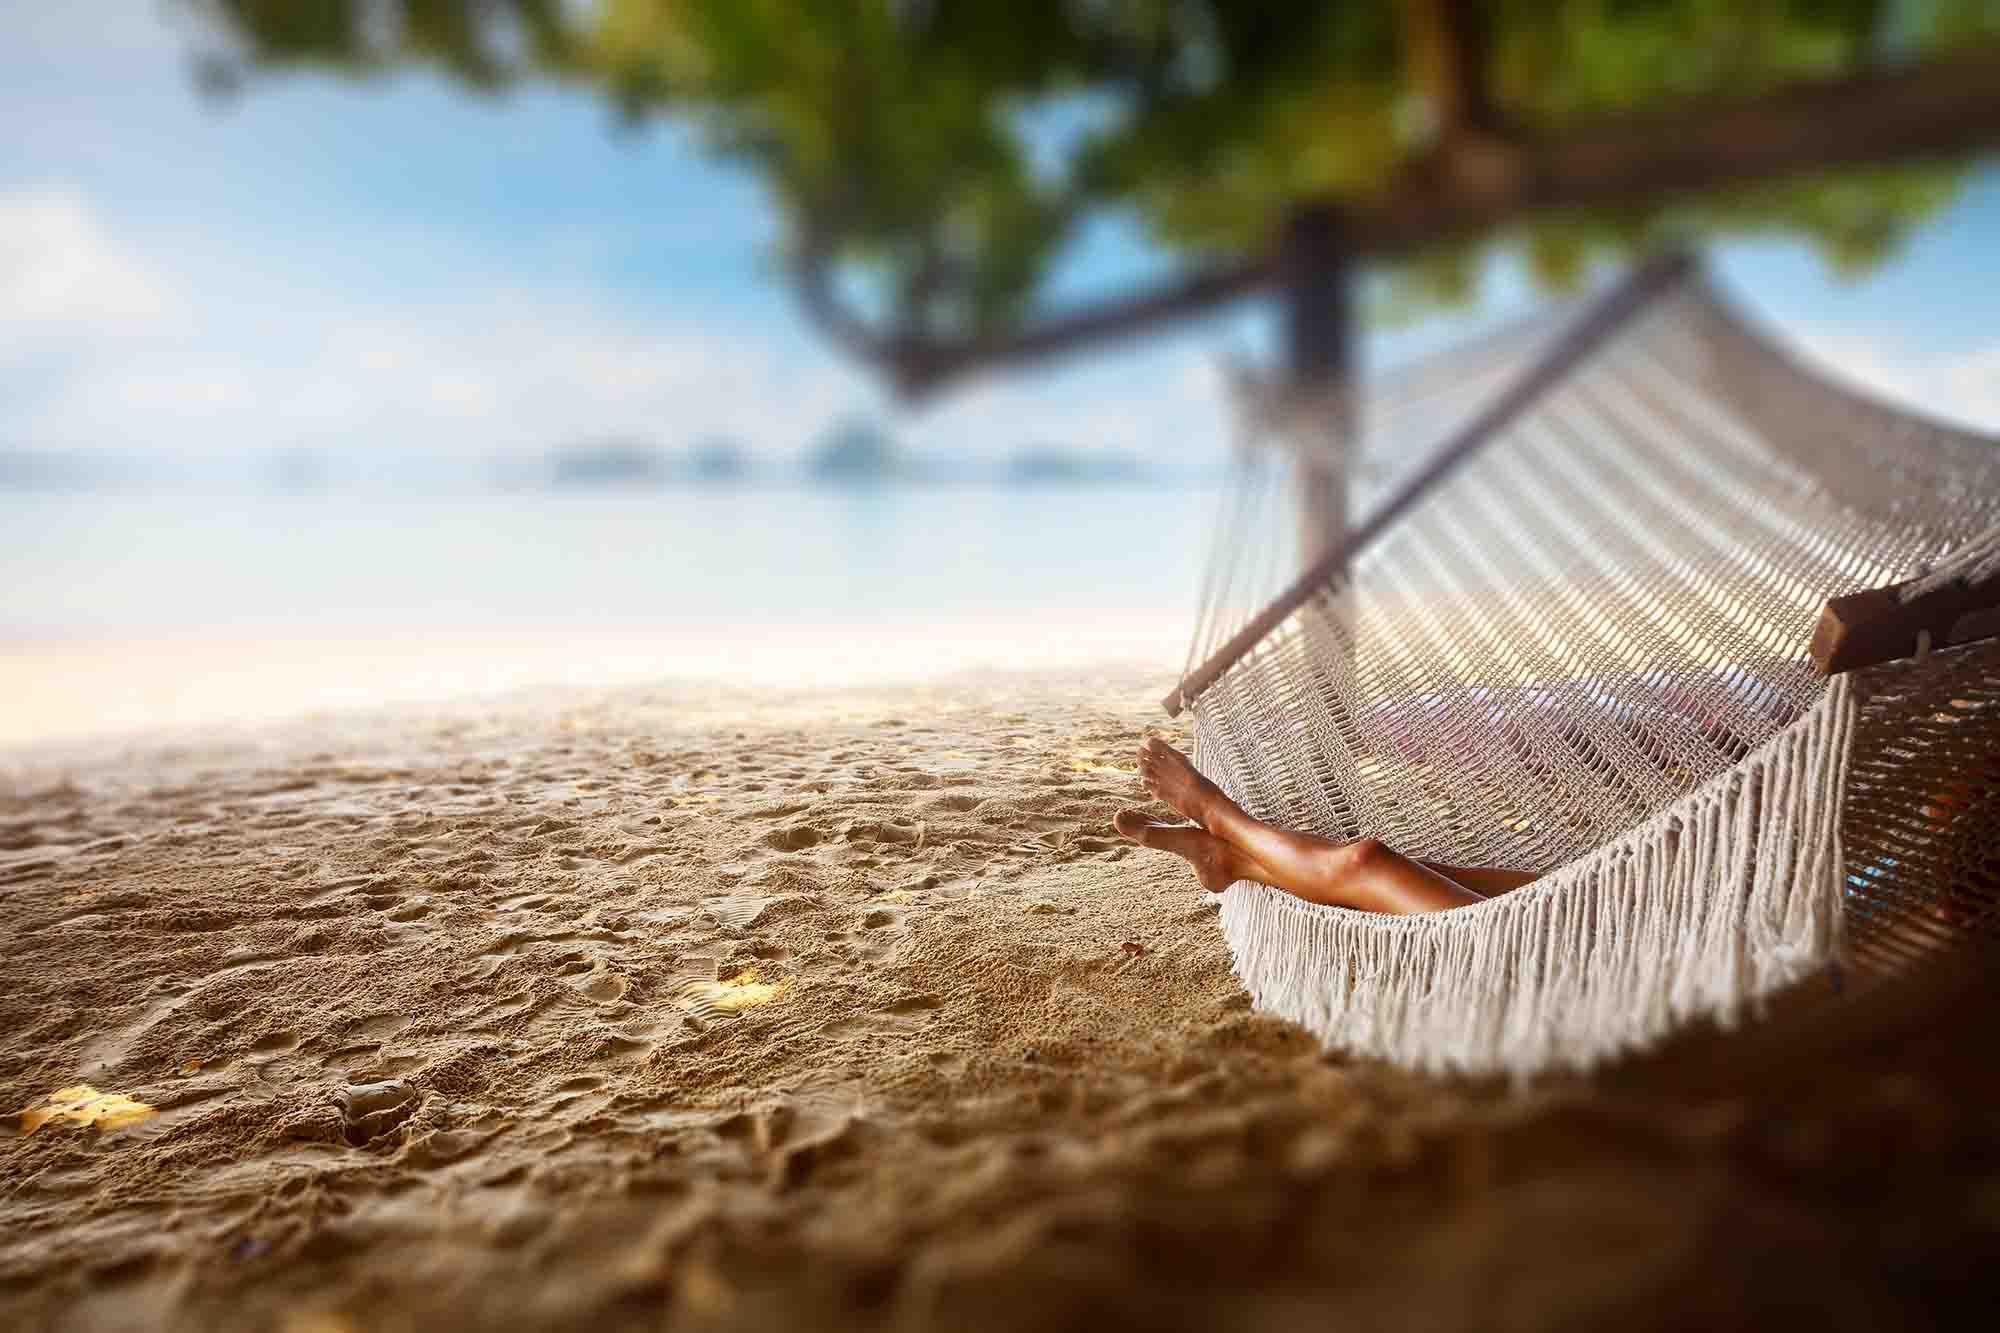 lying in a hammock by the beach